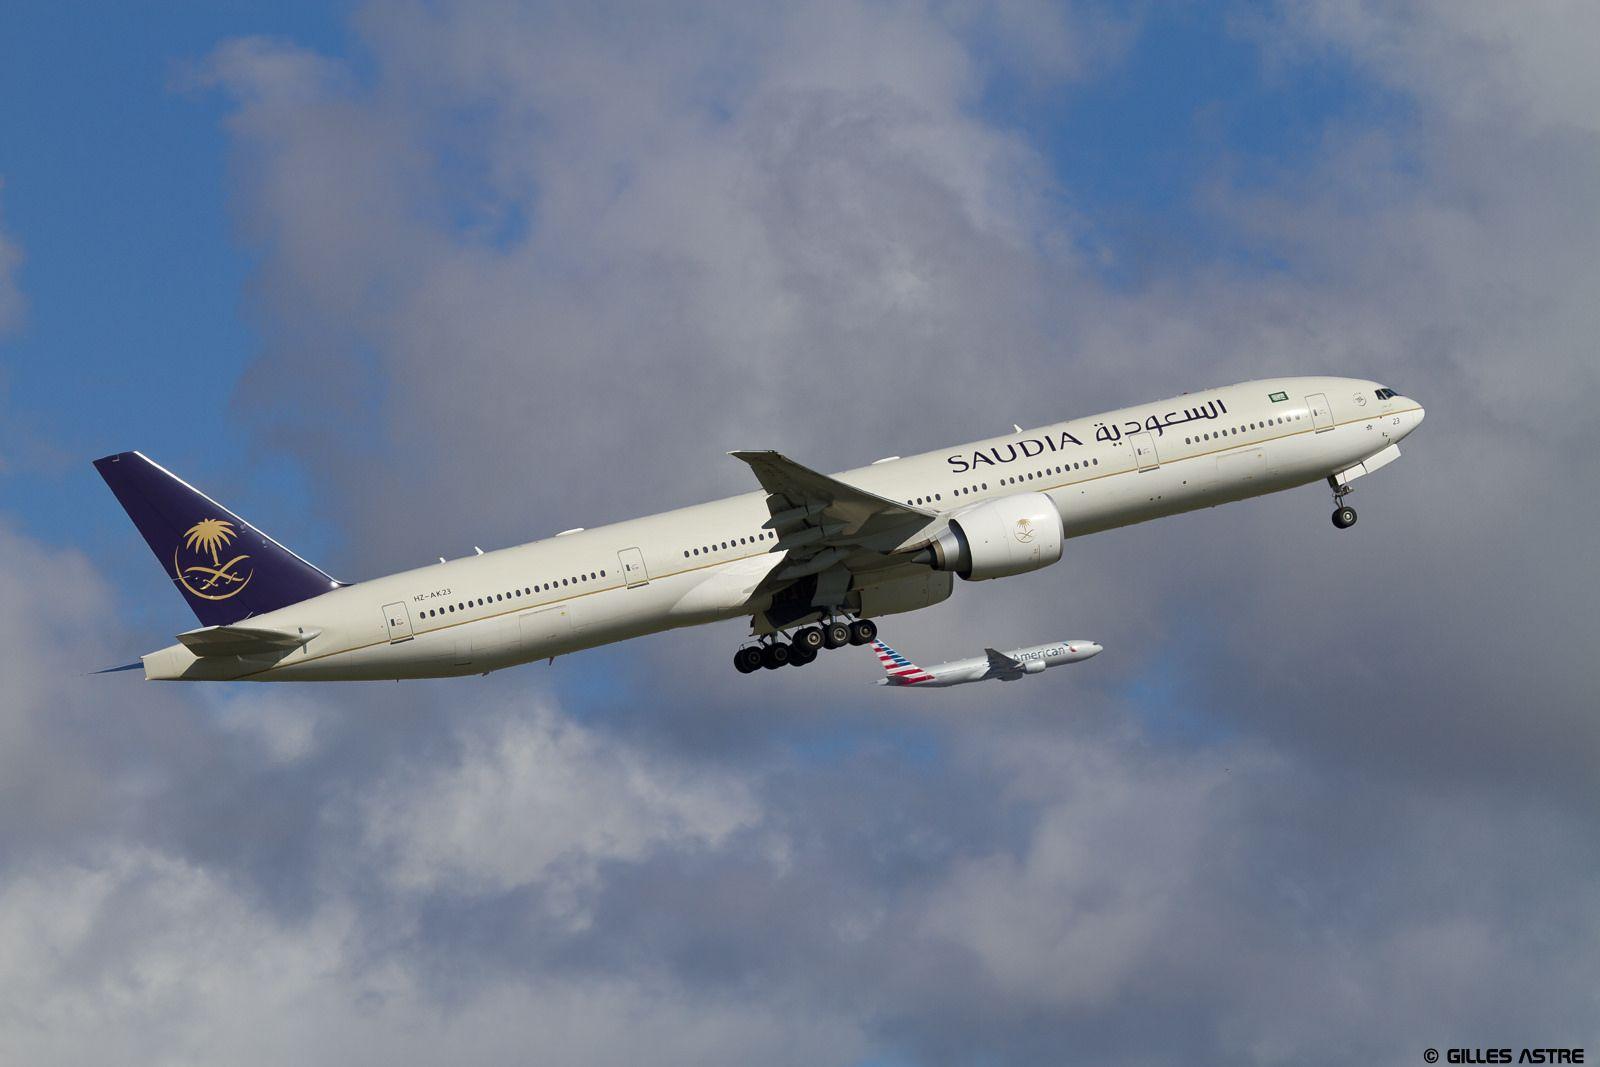 https://flic.kr/p/z4NqaH | LFPG 20 septembre 2015 Boeing 777 Saudia HZ-AK23